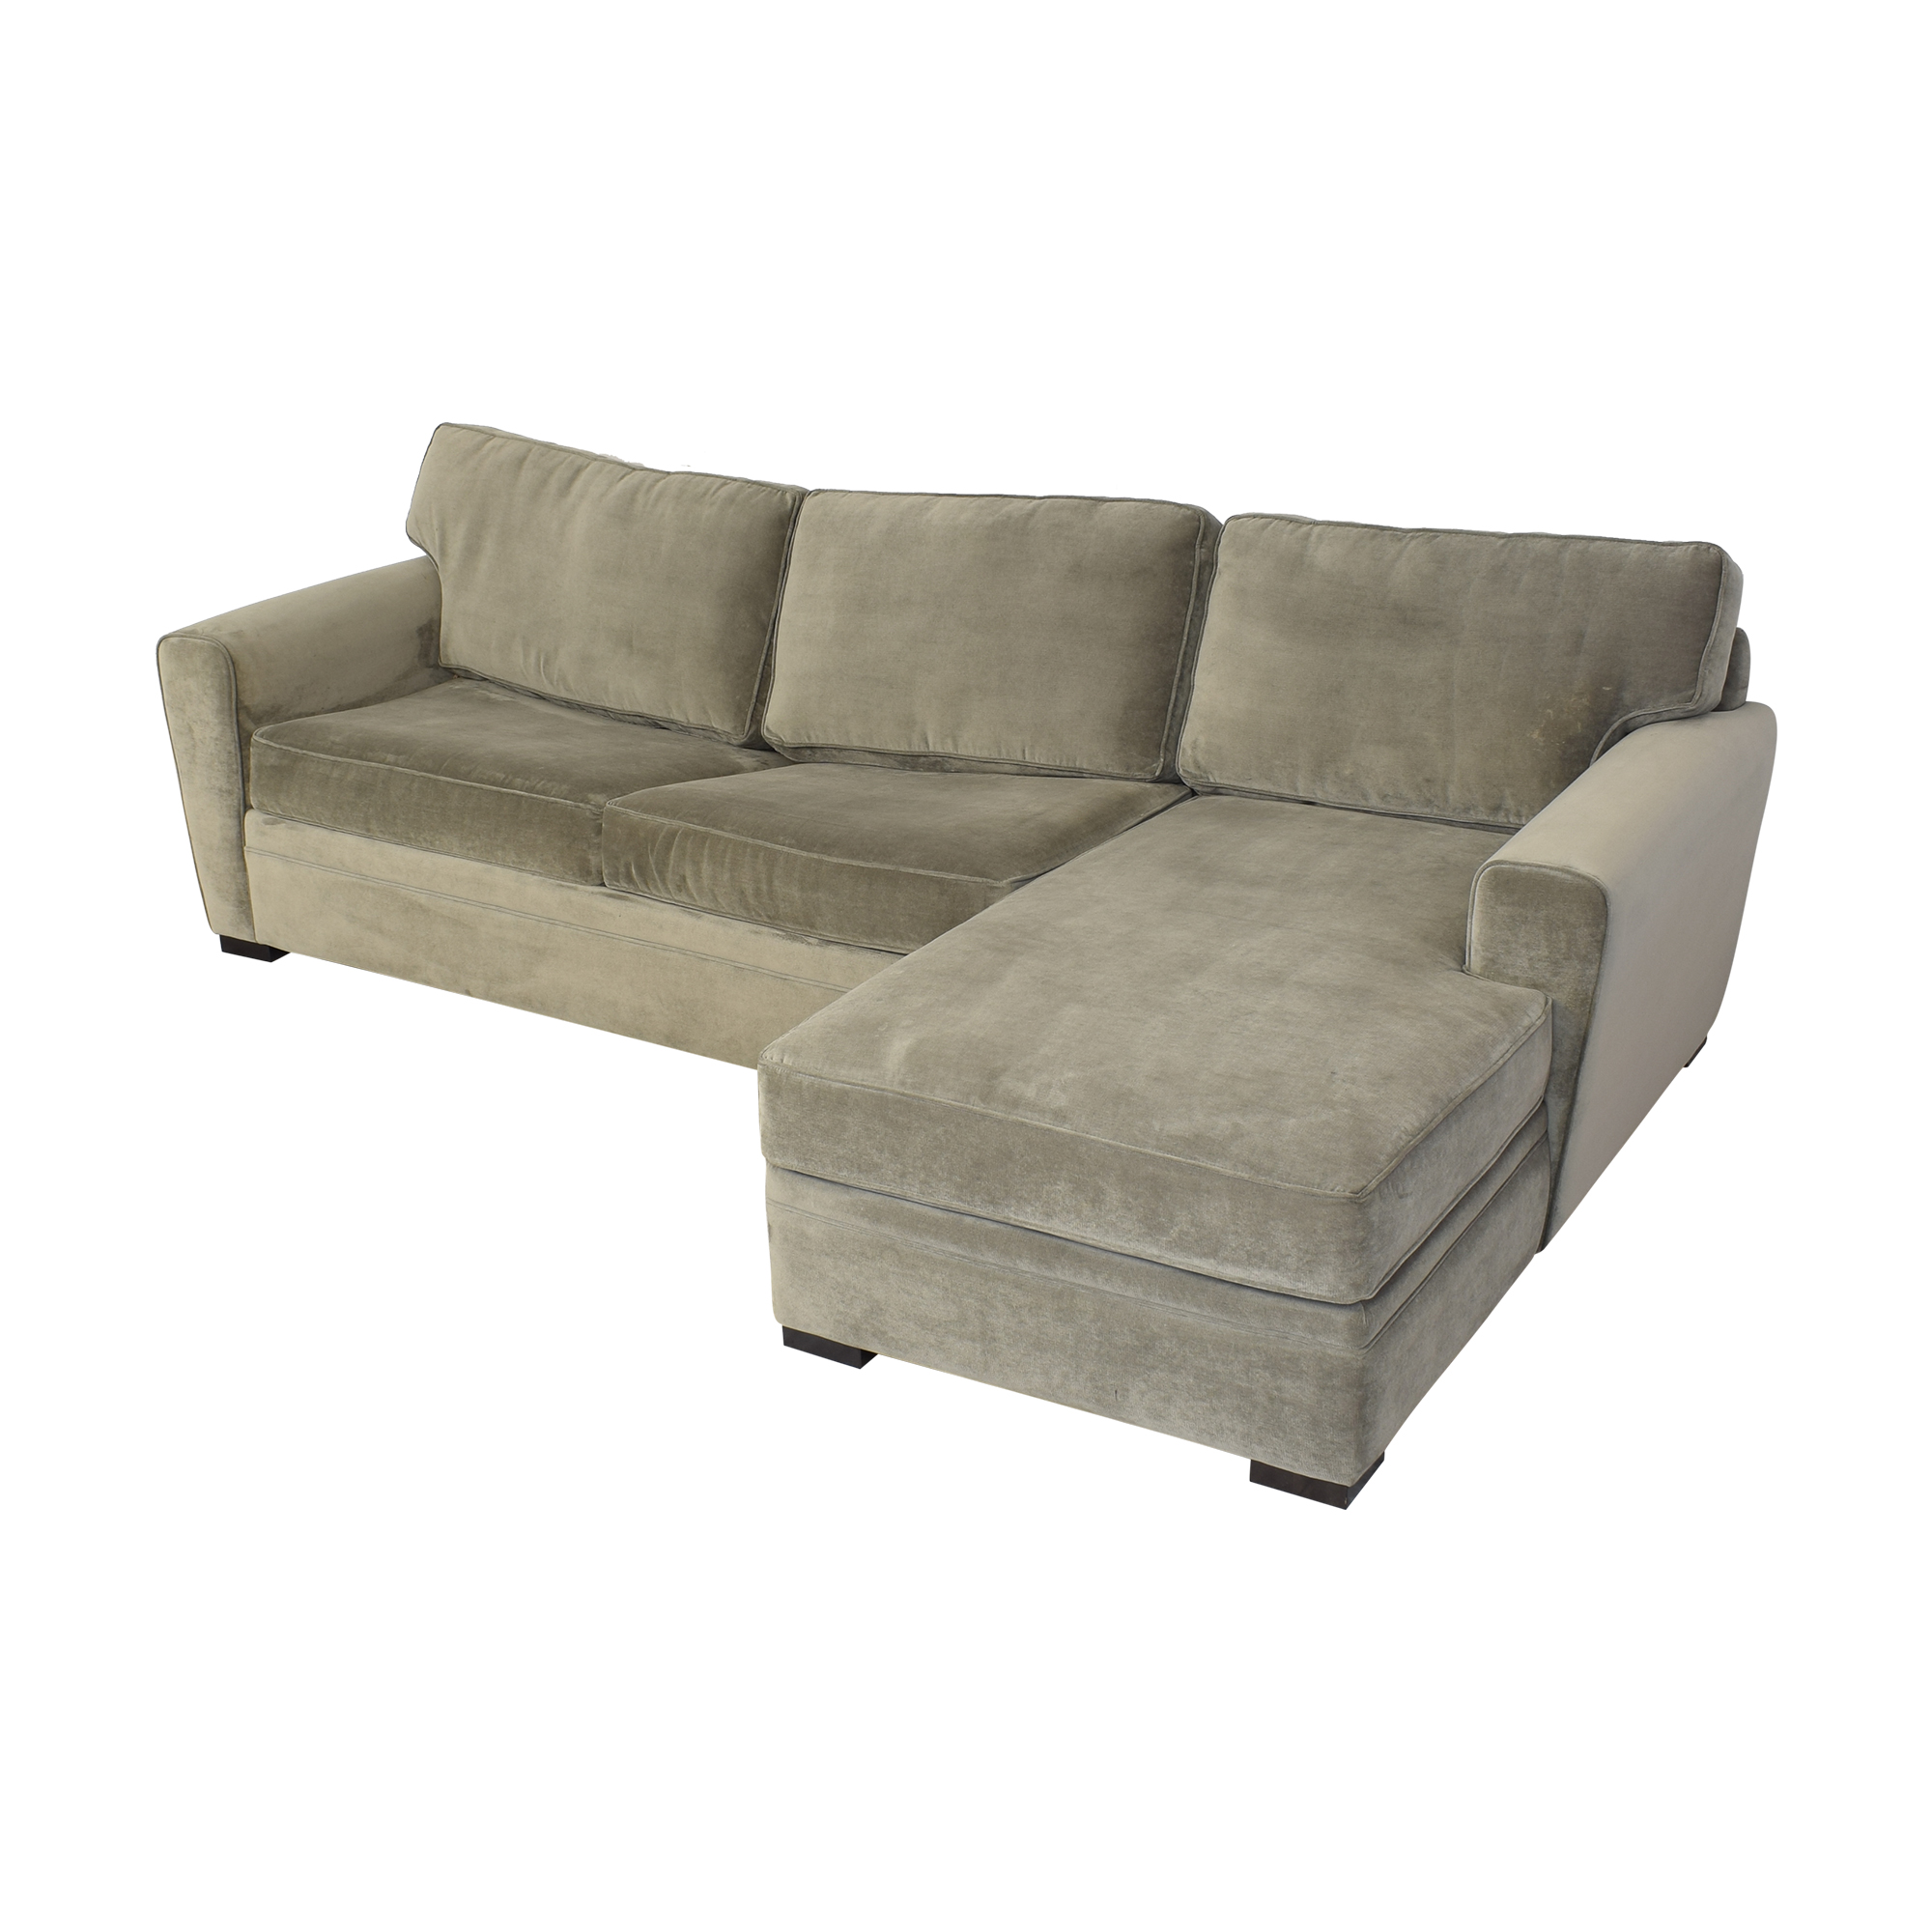 Raymour & Flanigan Artemis II Sectional Sofa with Sleeper / Sectionals